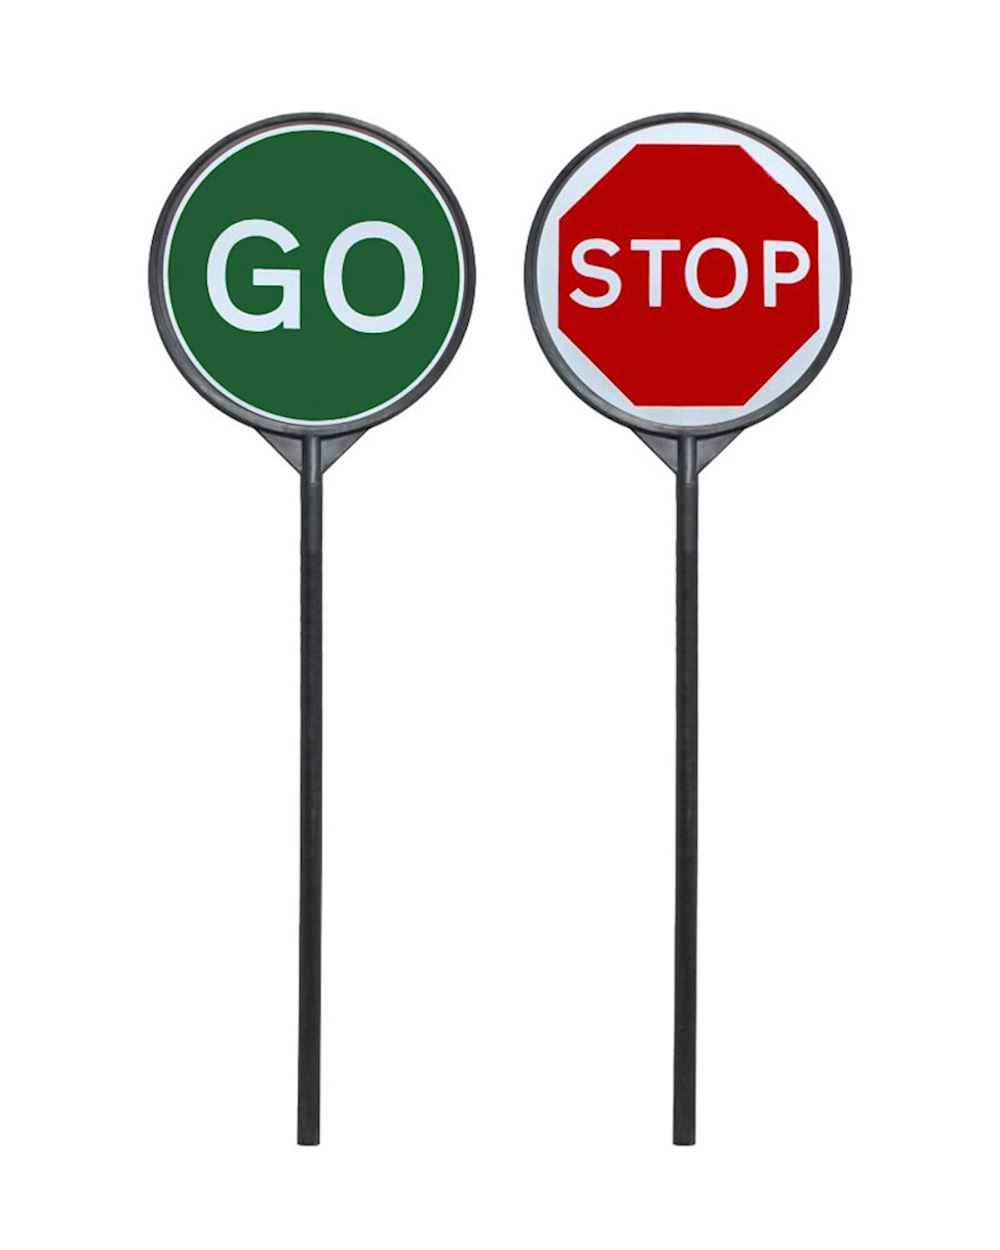 lollipop plastic stop and go traffic sign from aspli safety. Black Bedroom Furniture Sets. Home Design Ideas